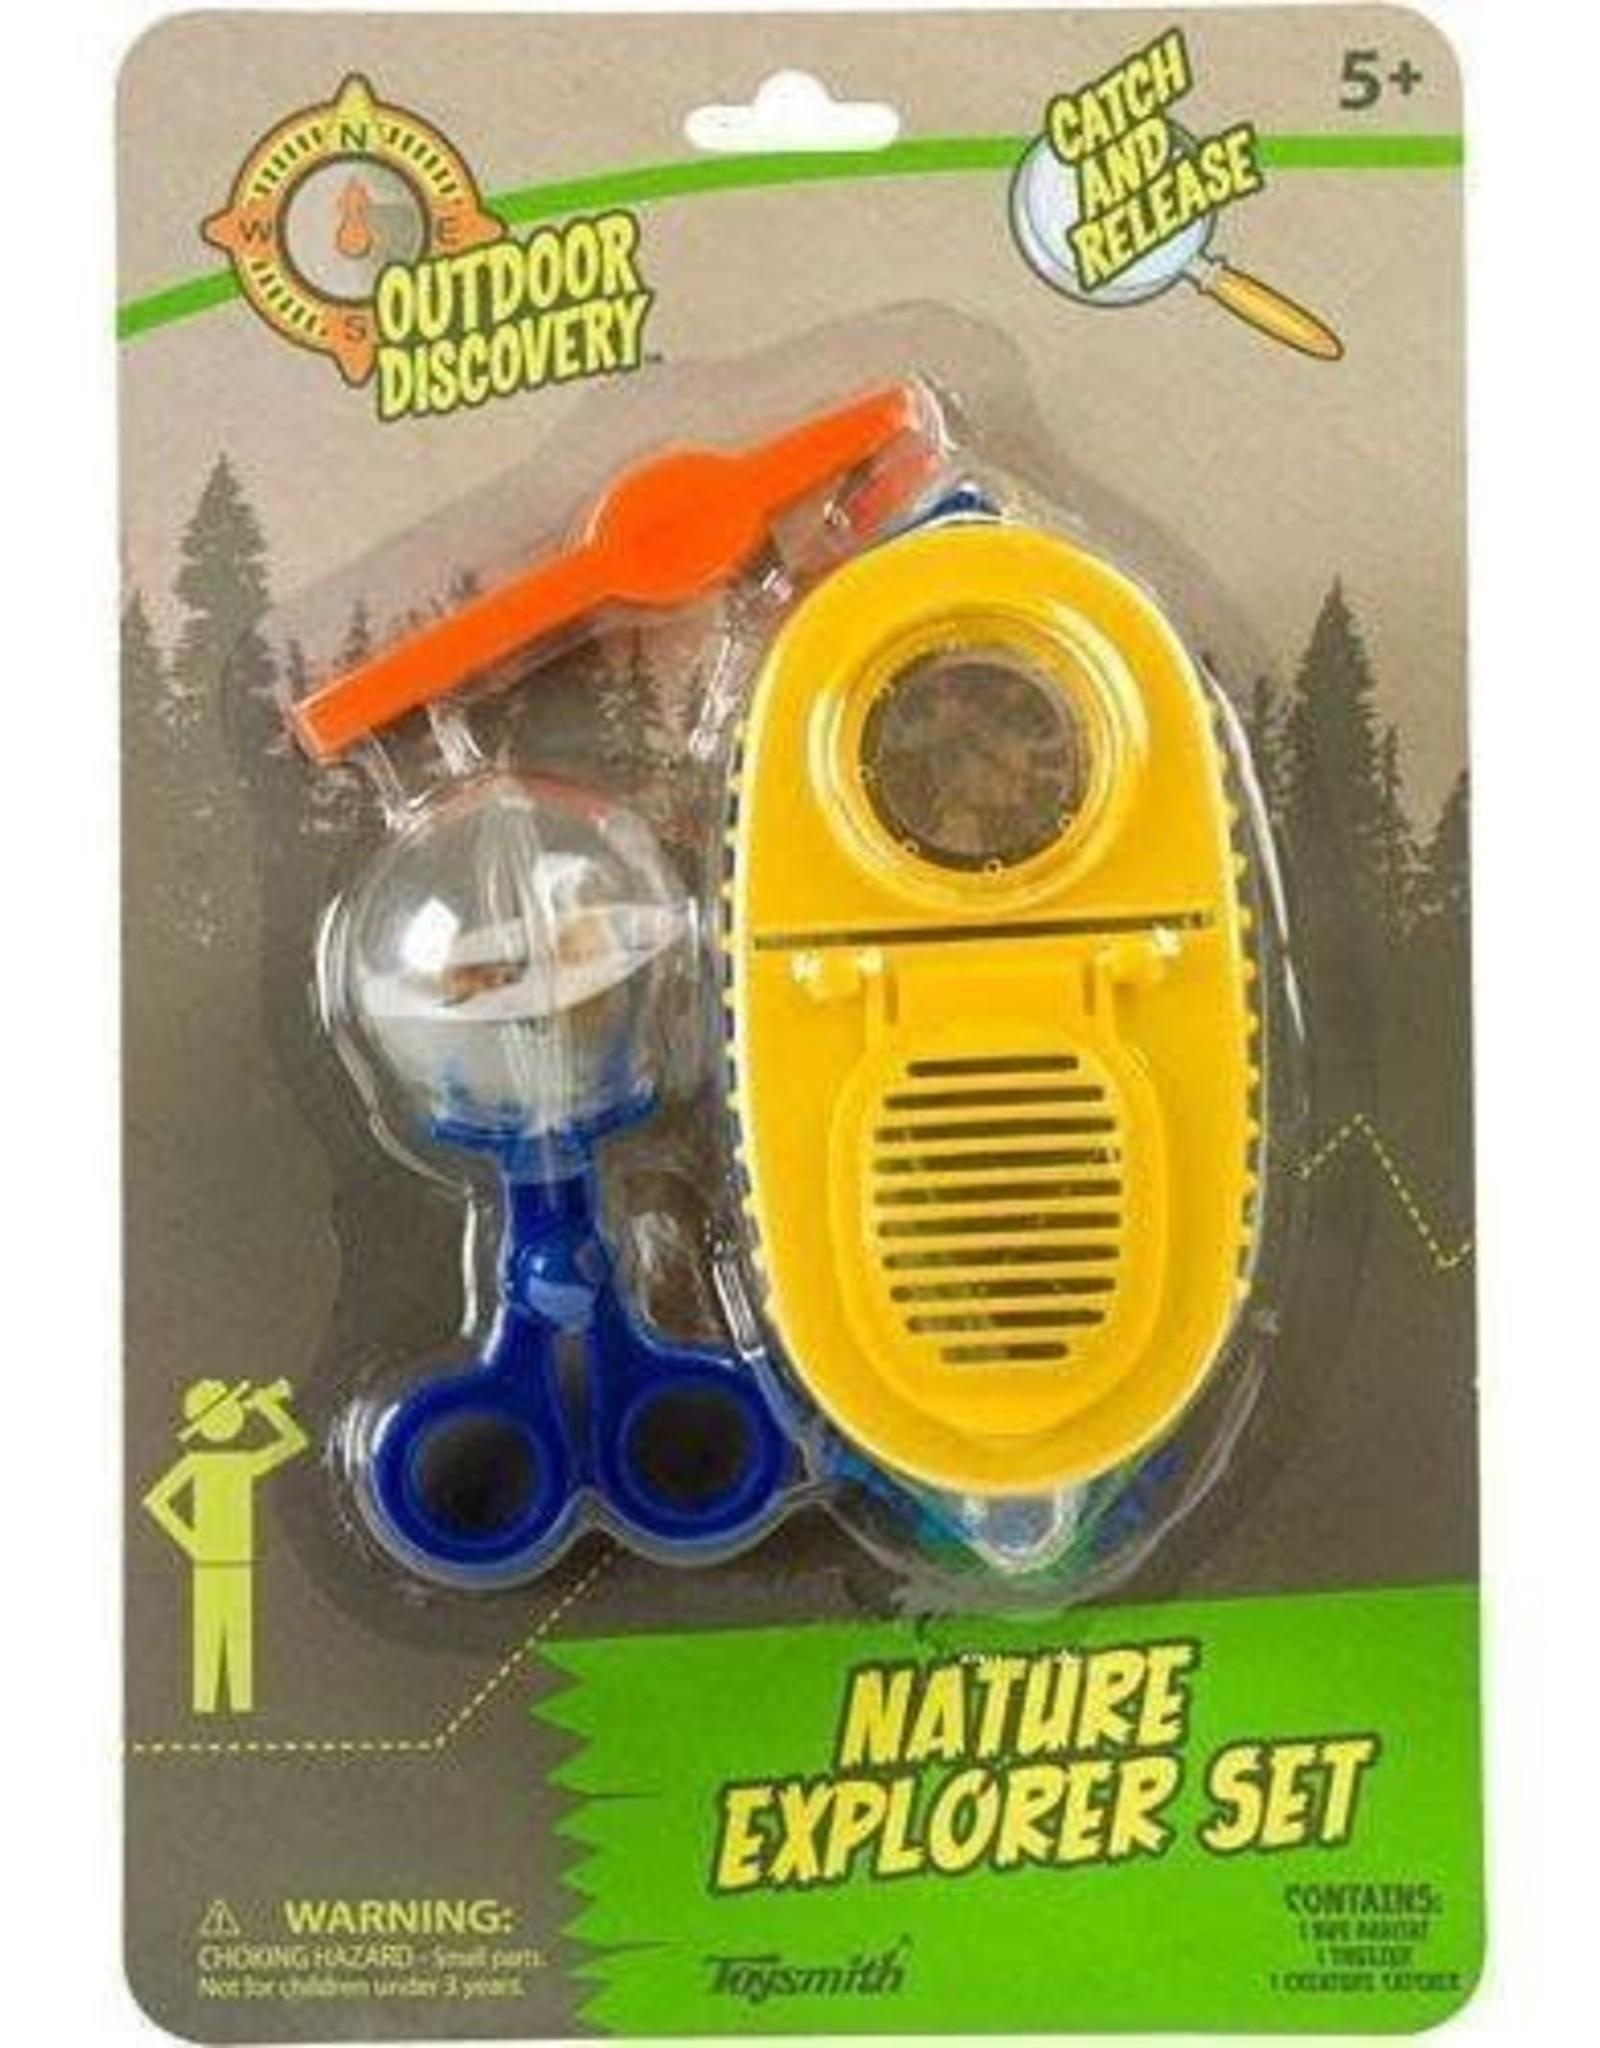 Nature Explorer Set